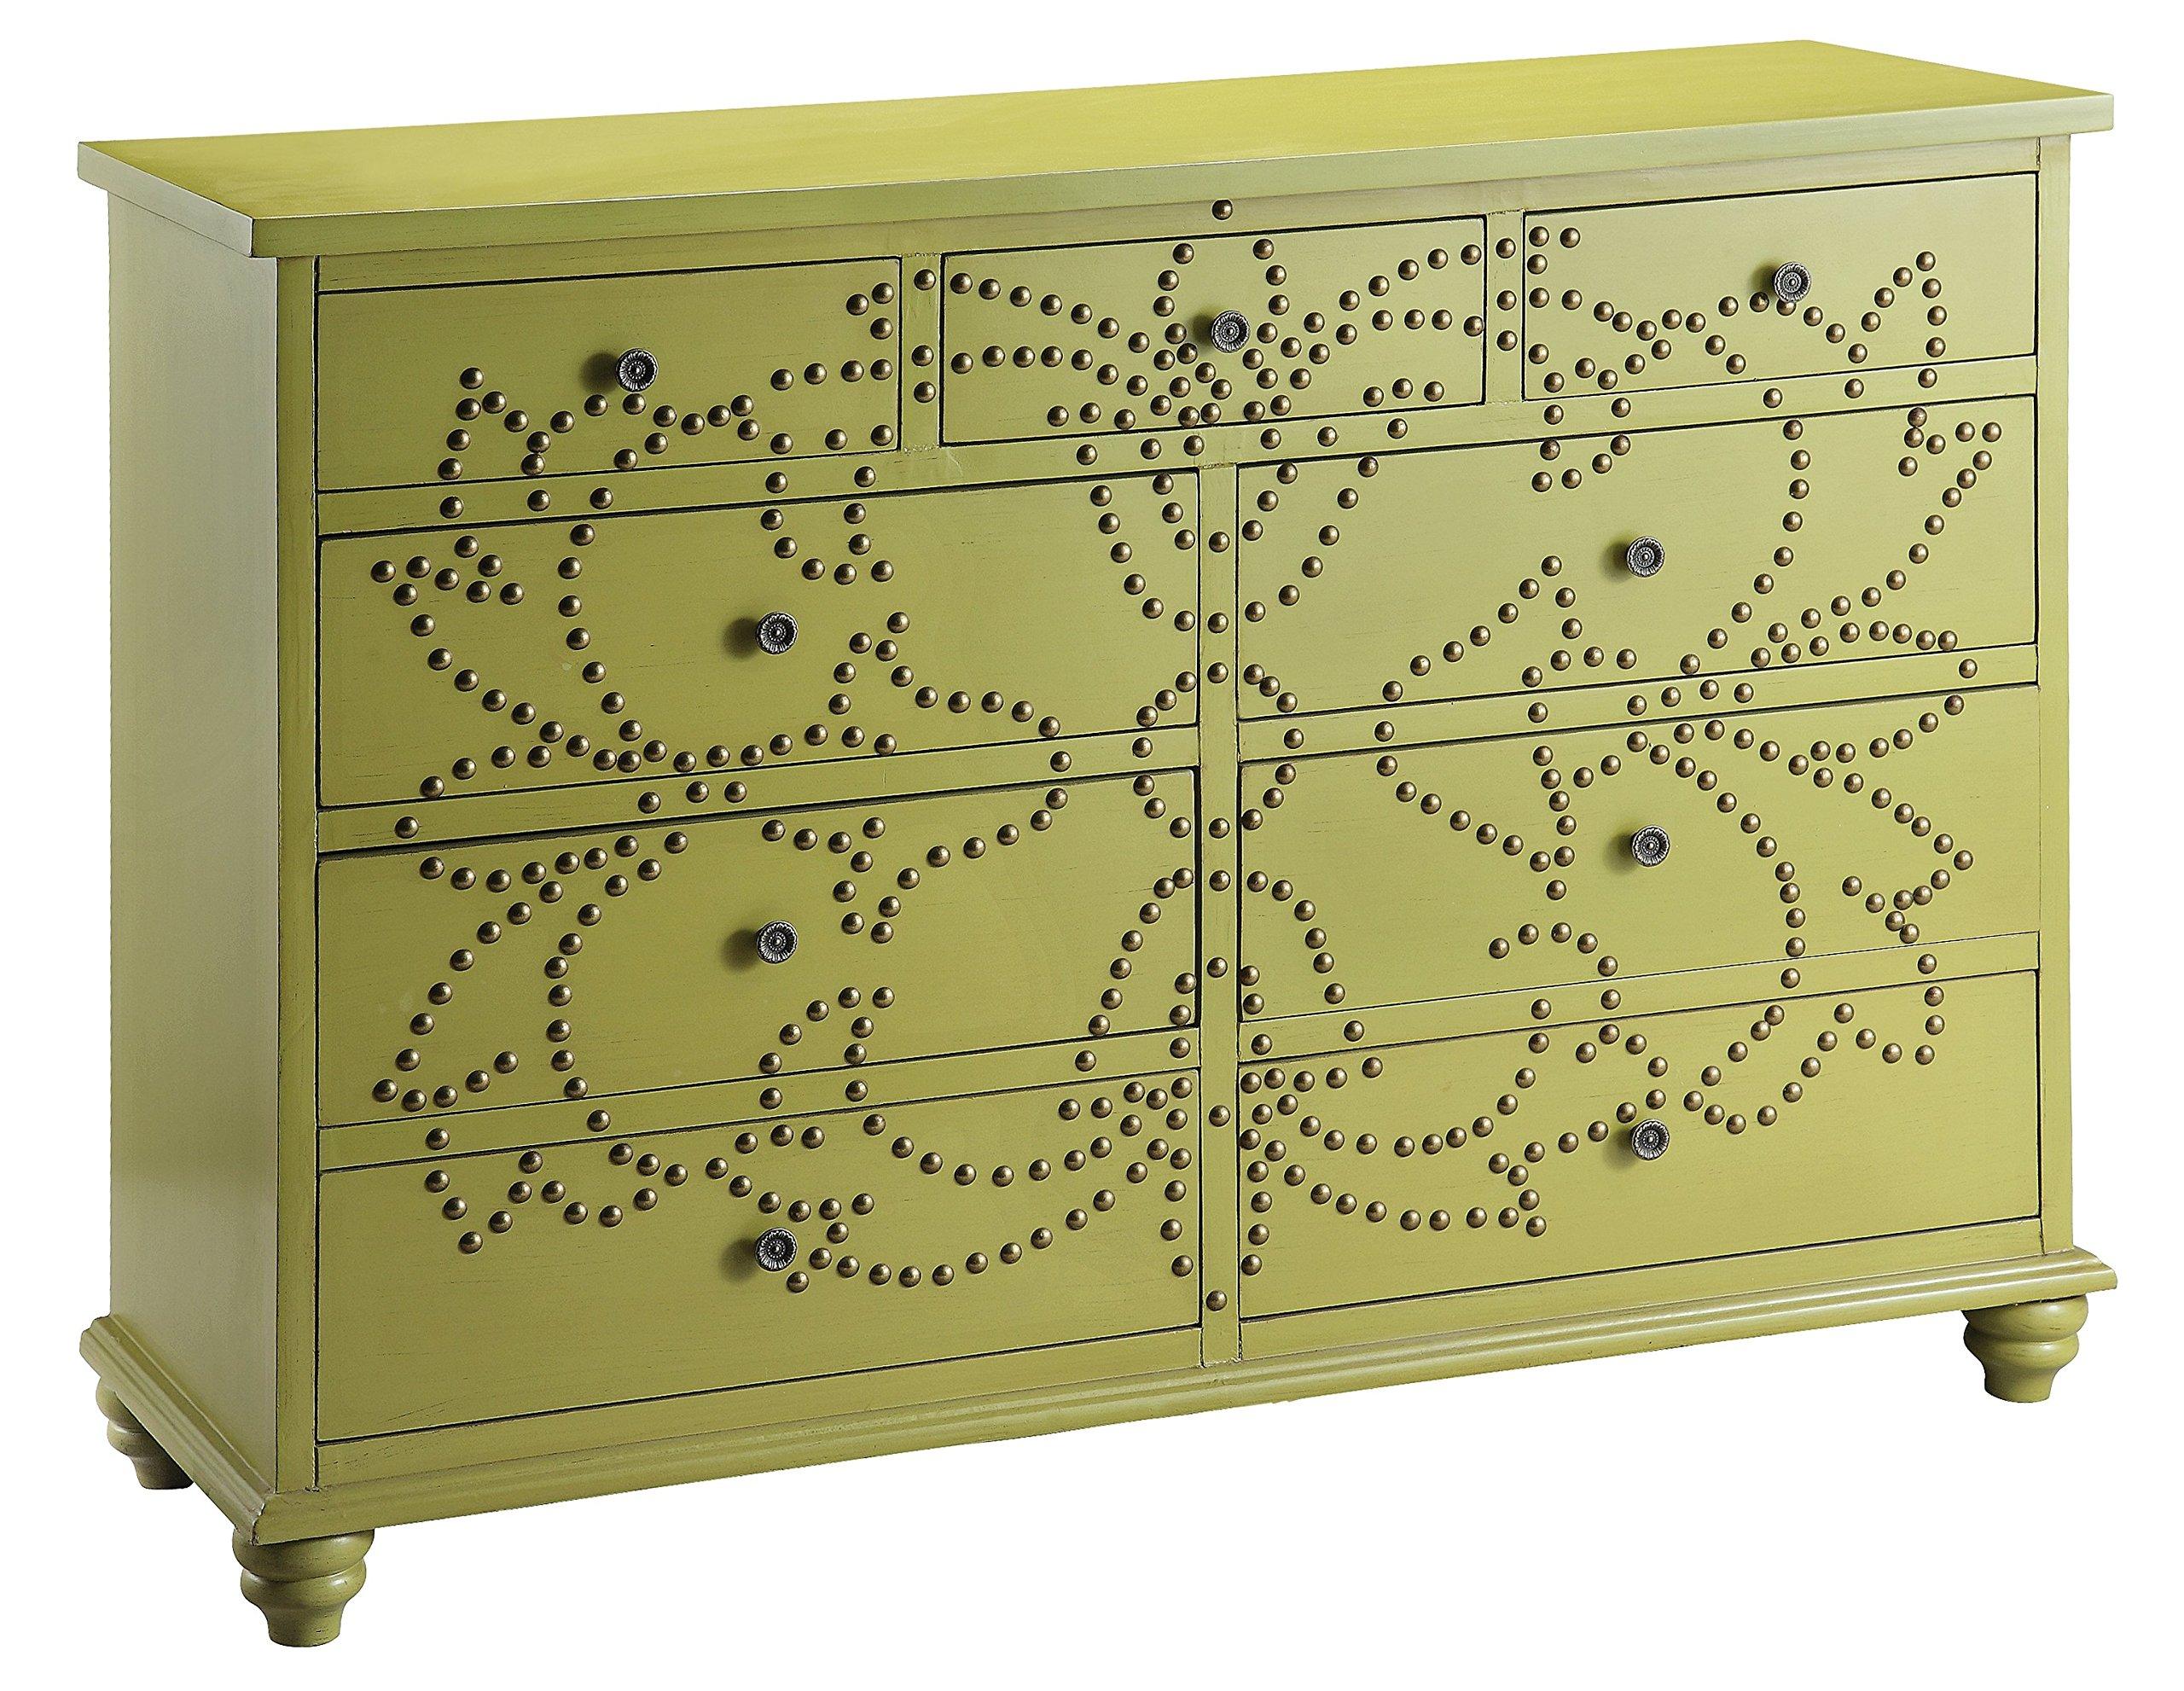 Stein World Furniture Ian Accent Chest, Light Green